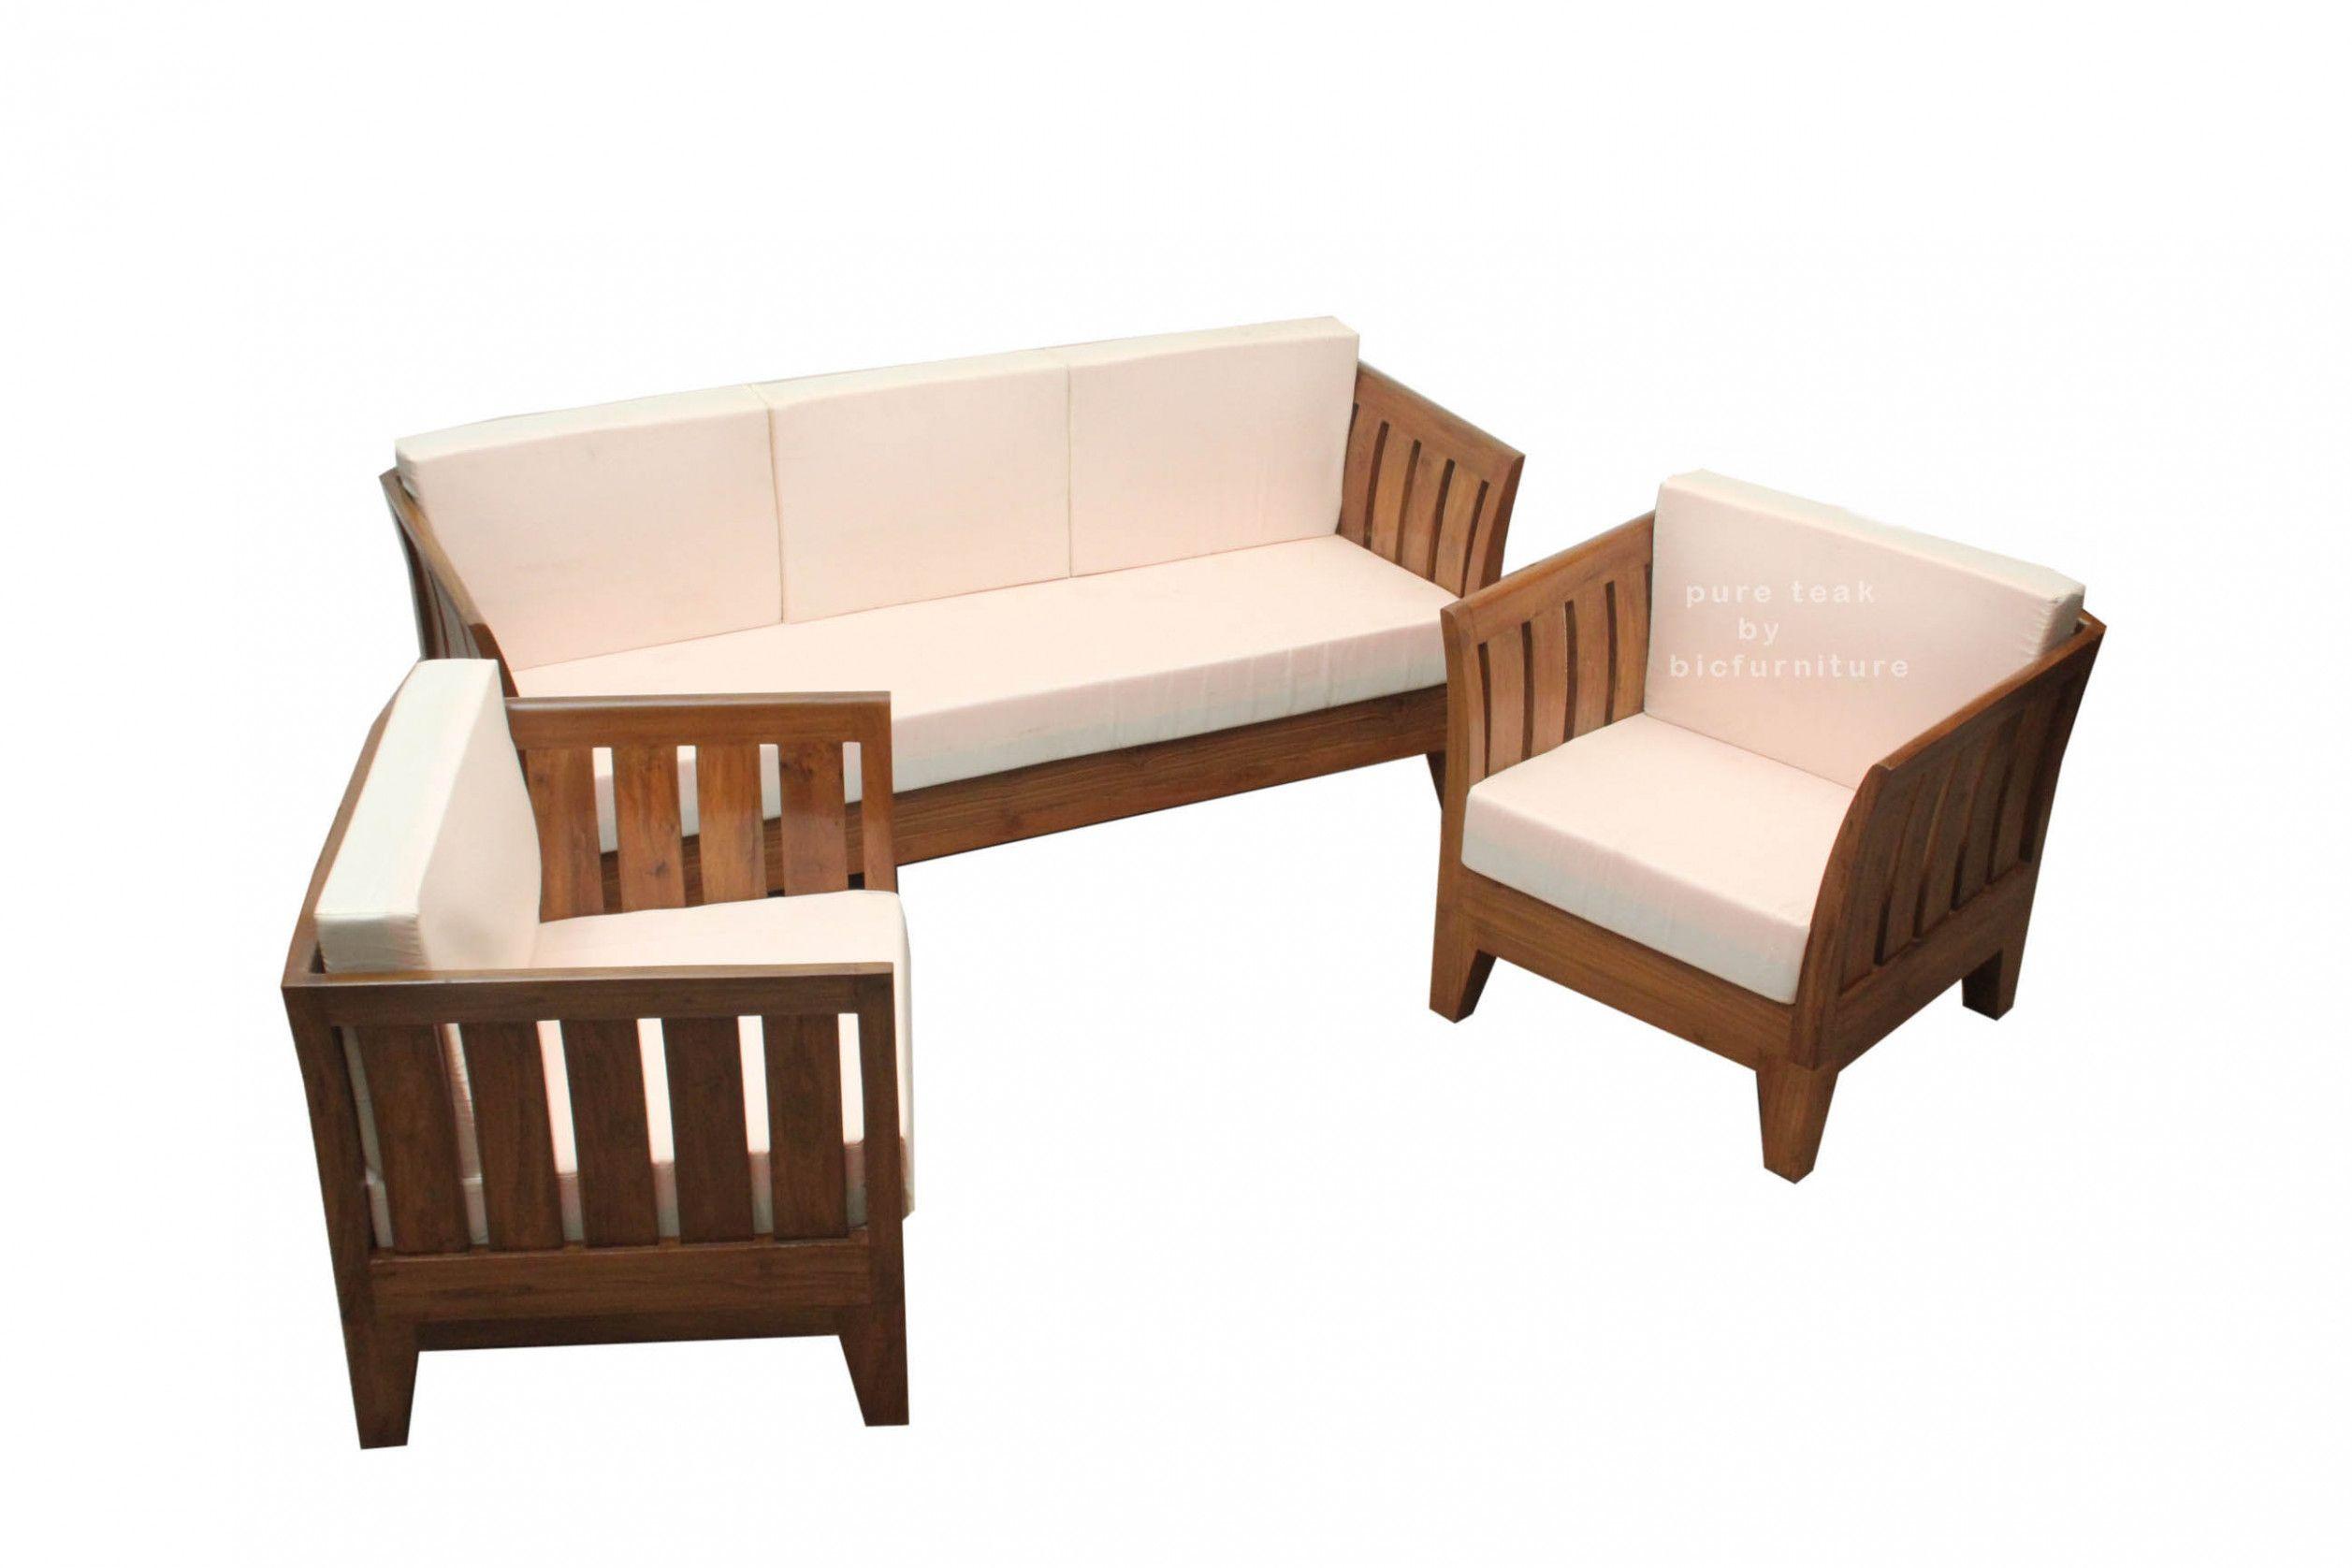 Images Of Wooden Sofa Set Robert Wan In 2020 Wooden Sofa Set Buy Living Room Furniture Sofa Set Designs